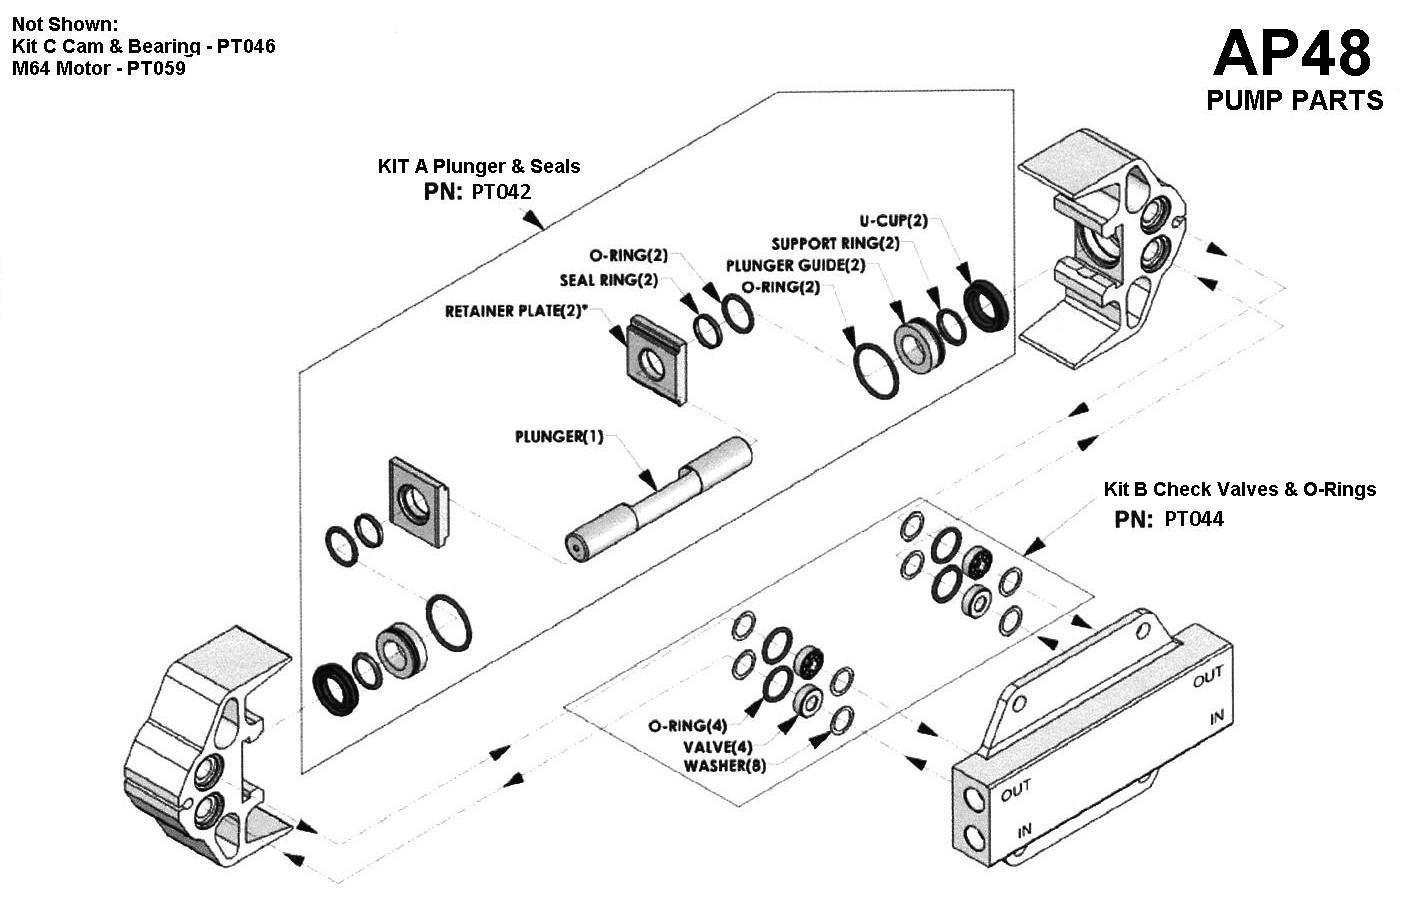 Ap48 pumptec 356 1200psi pump with motor parts breakdown pooptronica